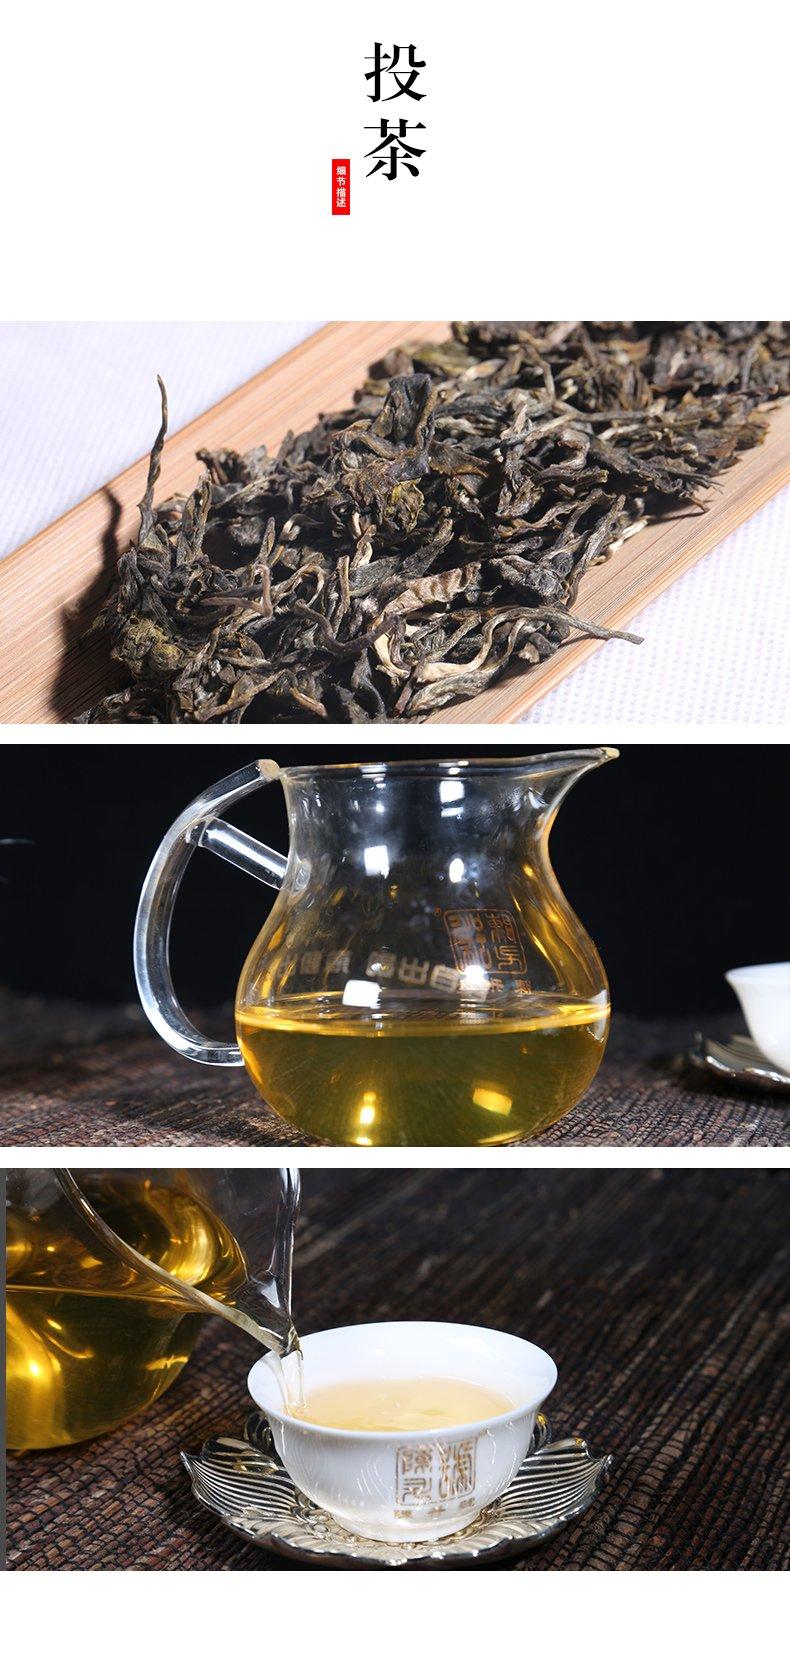 2016 Lao Banzhang Old Tree Raw Pu-erh 125g Cake ChenShengHao Top China Puer Tea